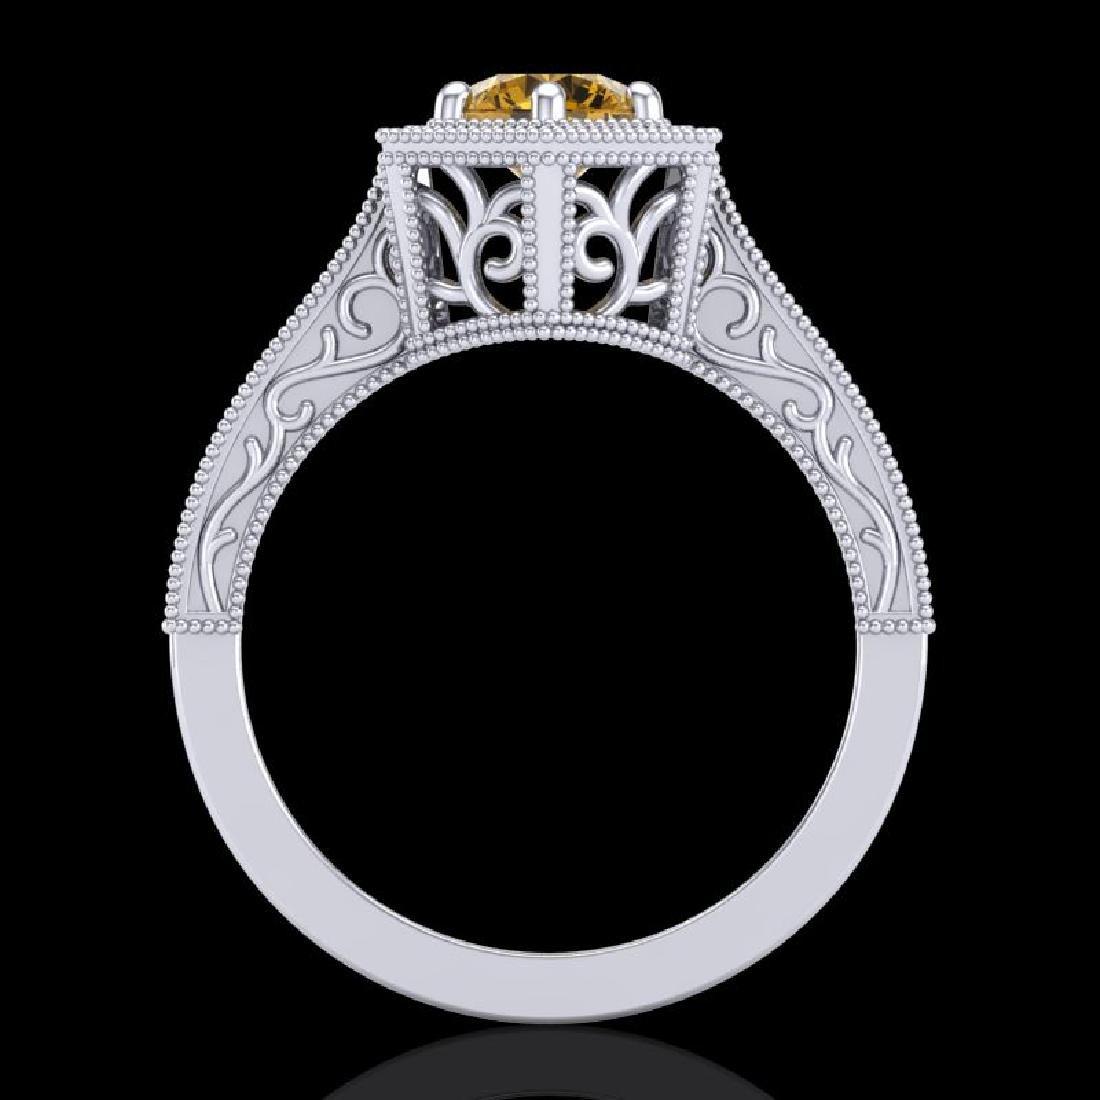 0.77 CTW Intense Fancy Yellow Diamond Engagement Art - 3